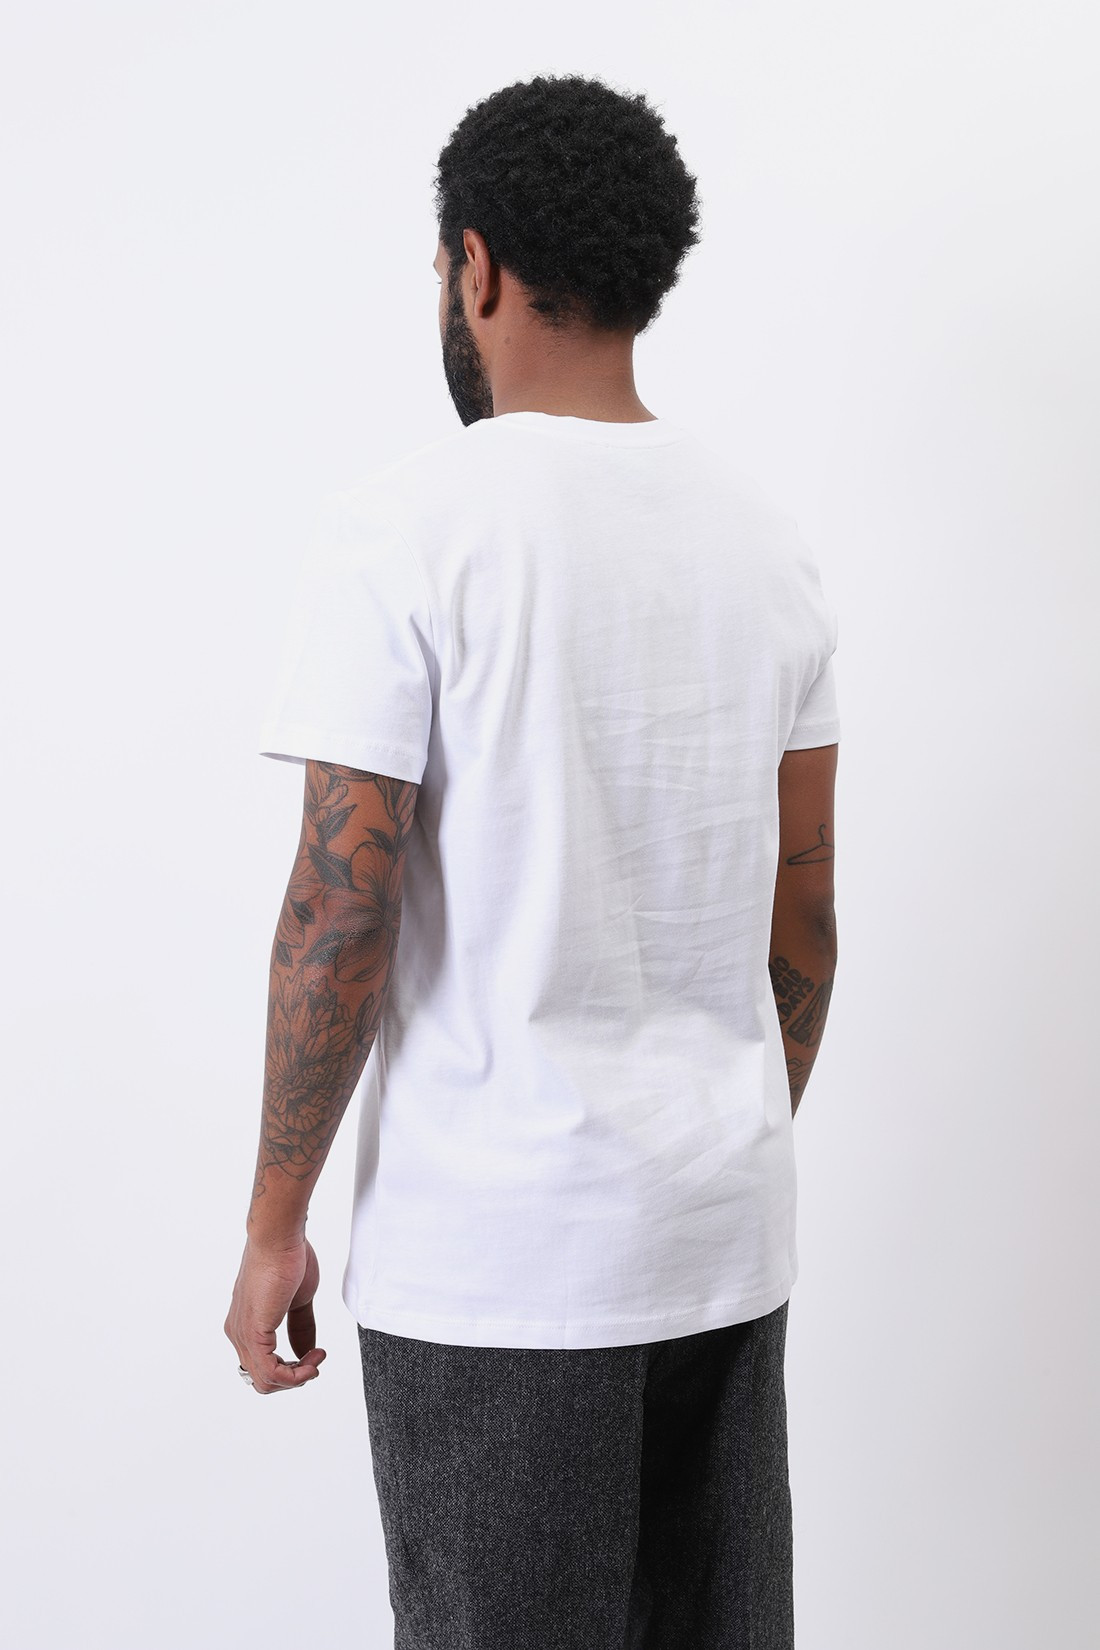 A.P.C. / T-shirt vpc Dark navy